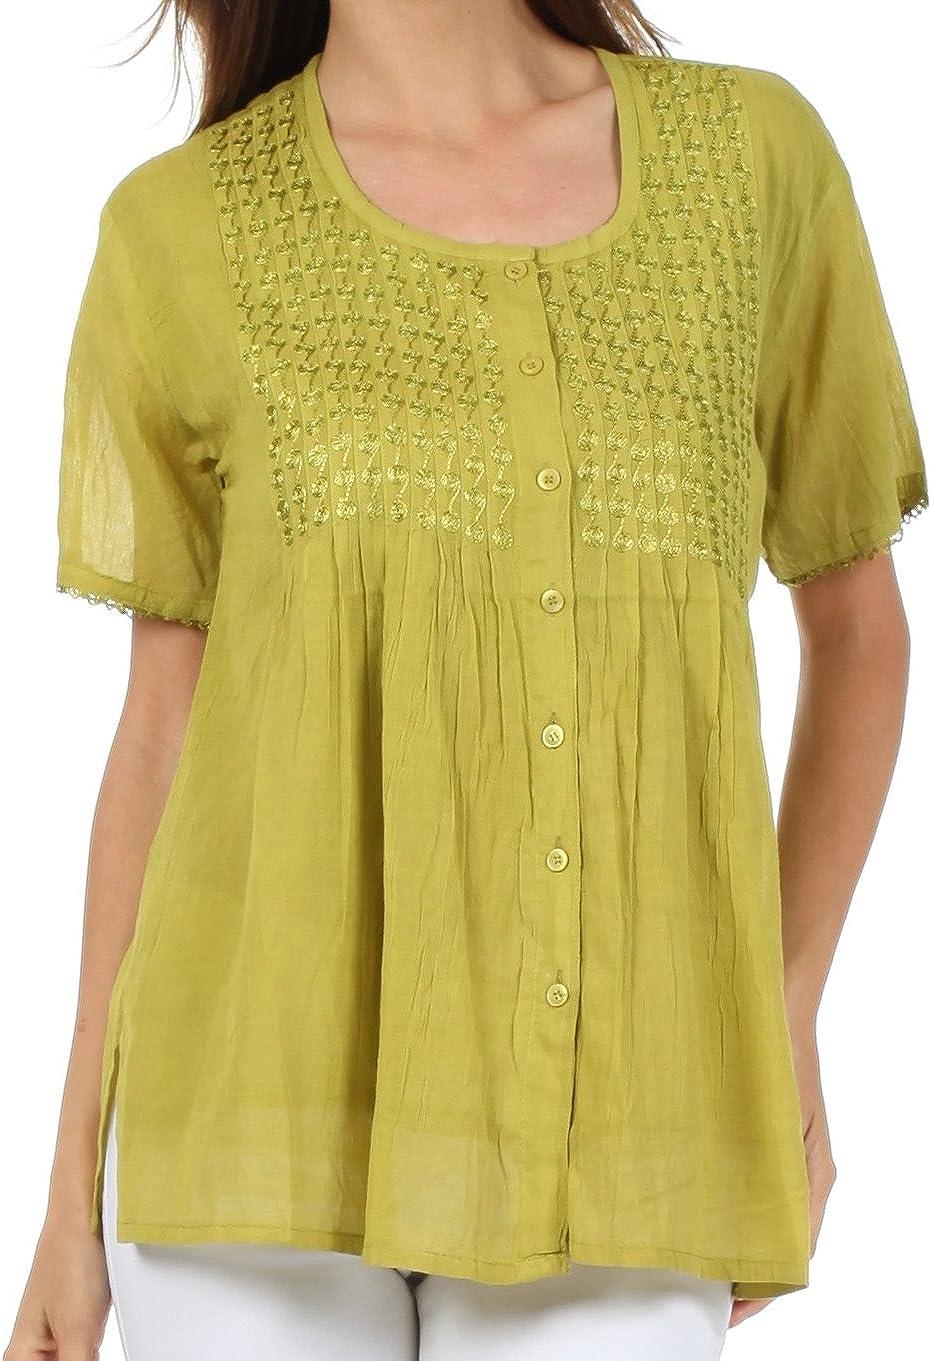 Sakkas Button Down Embroidered Short Sleeve Semi-Sheer Gauzy Cotton Top/Blouse